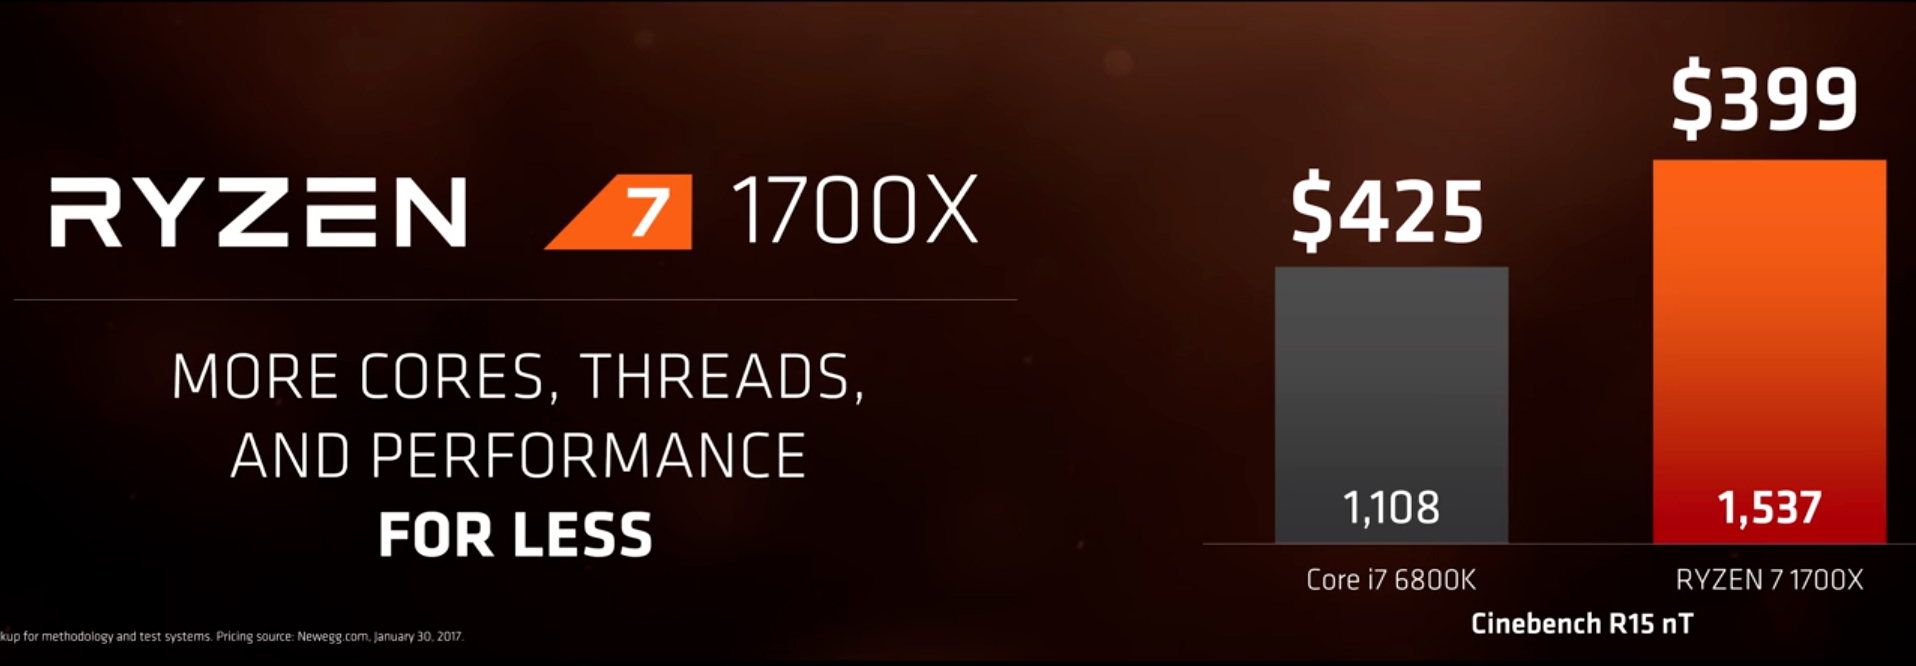 1700x 2